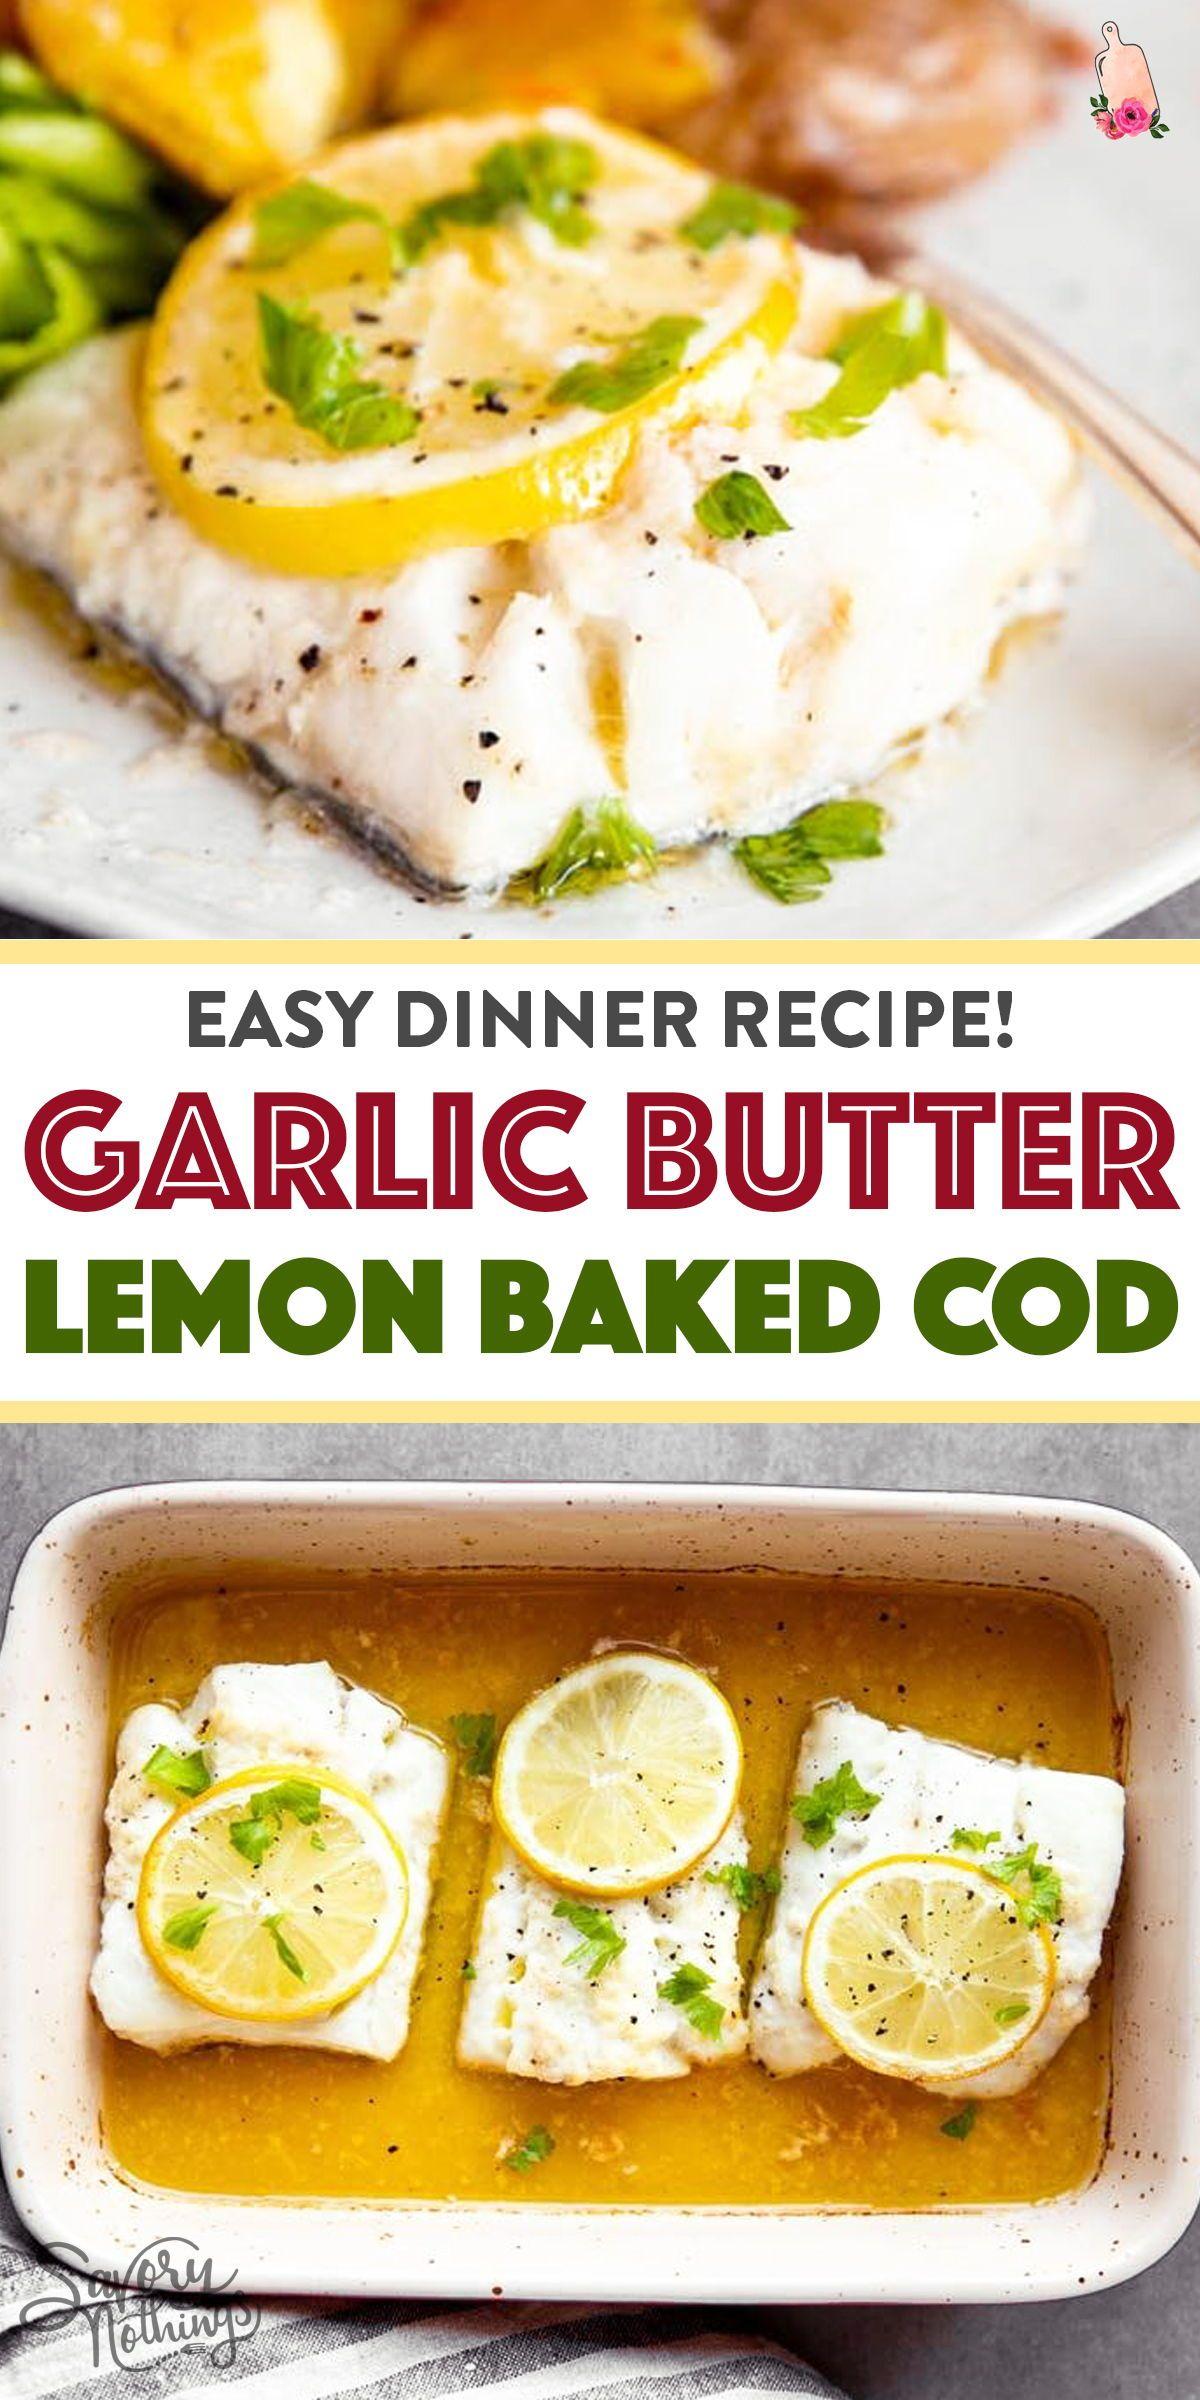 Garlic Butter Lemon Baked Cod in 2020 ...